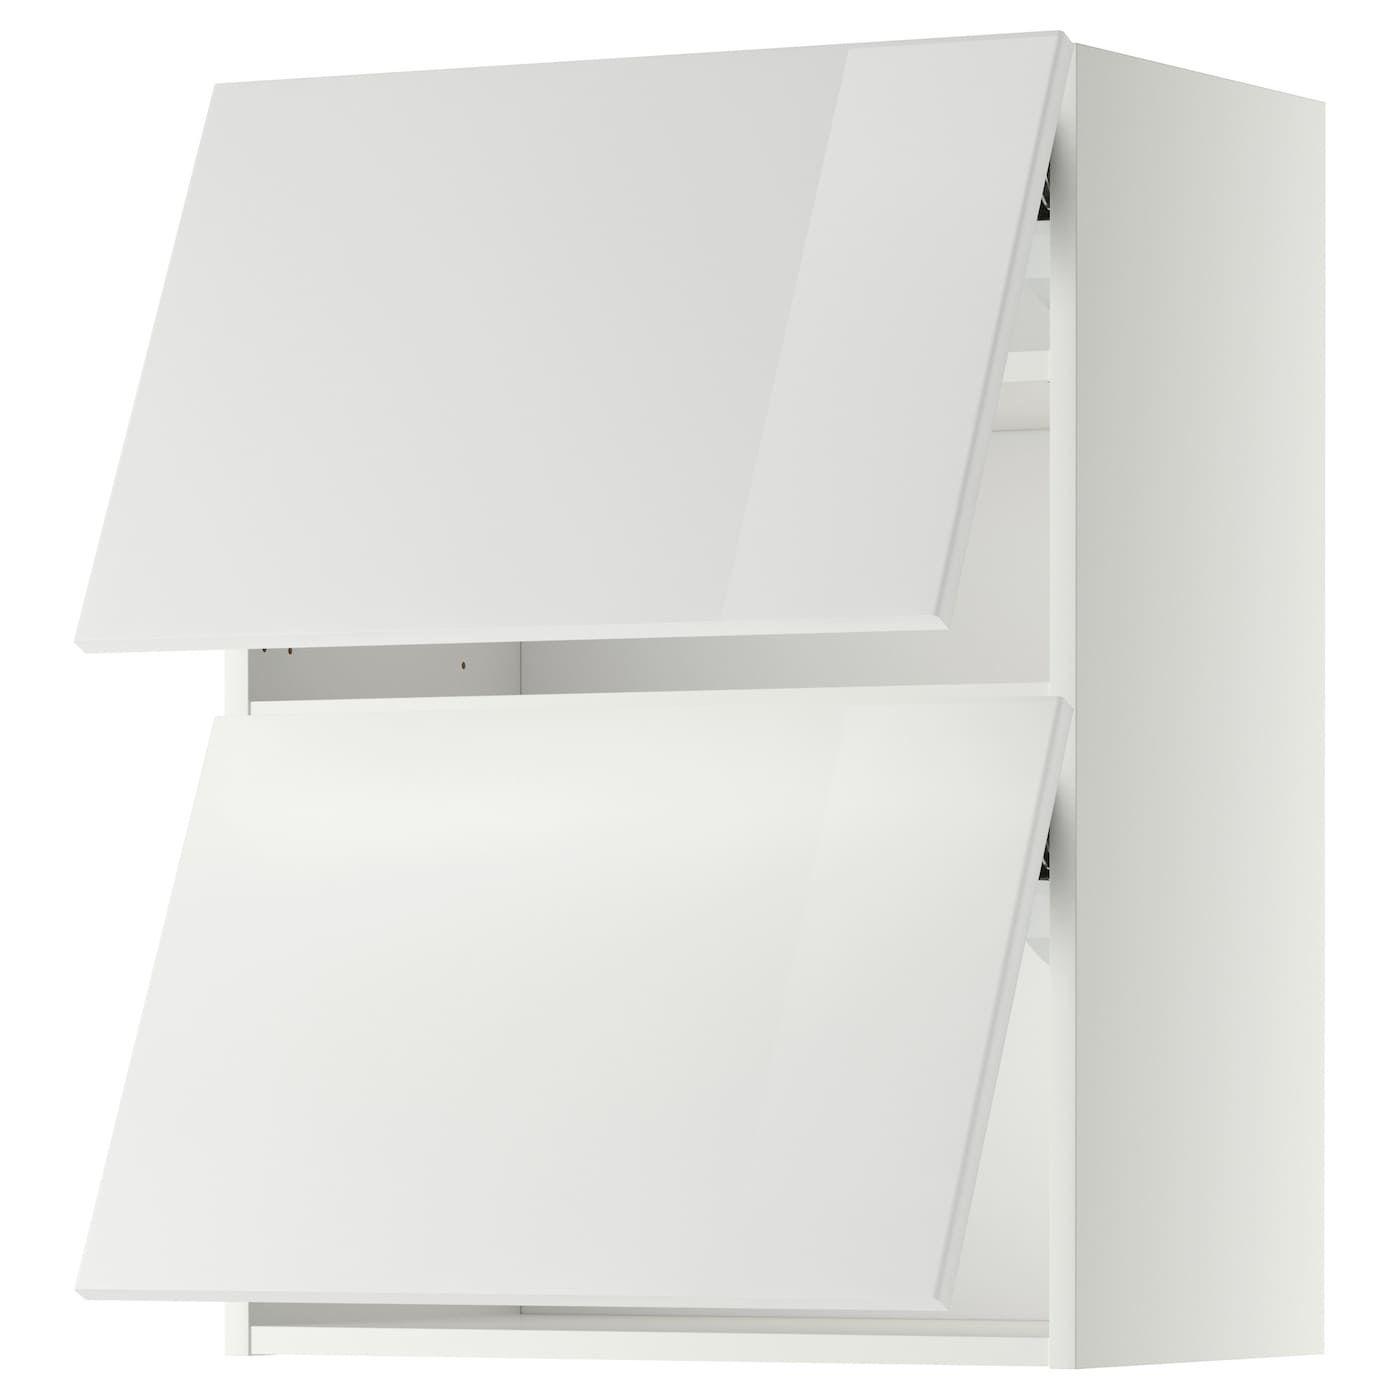 IKEA – METOD Wall cabinet horizontal w 2 doors